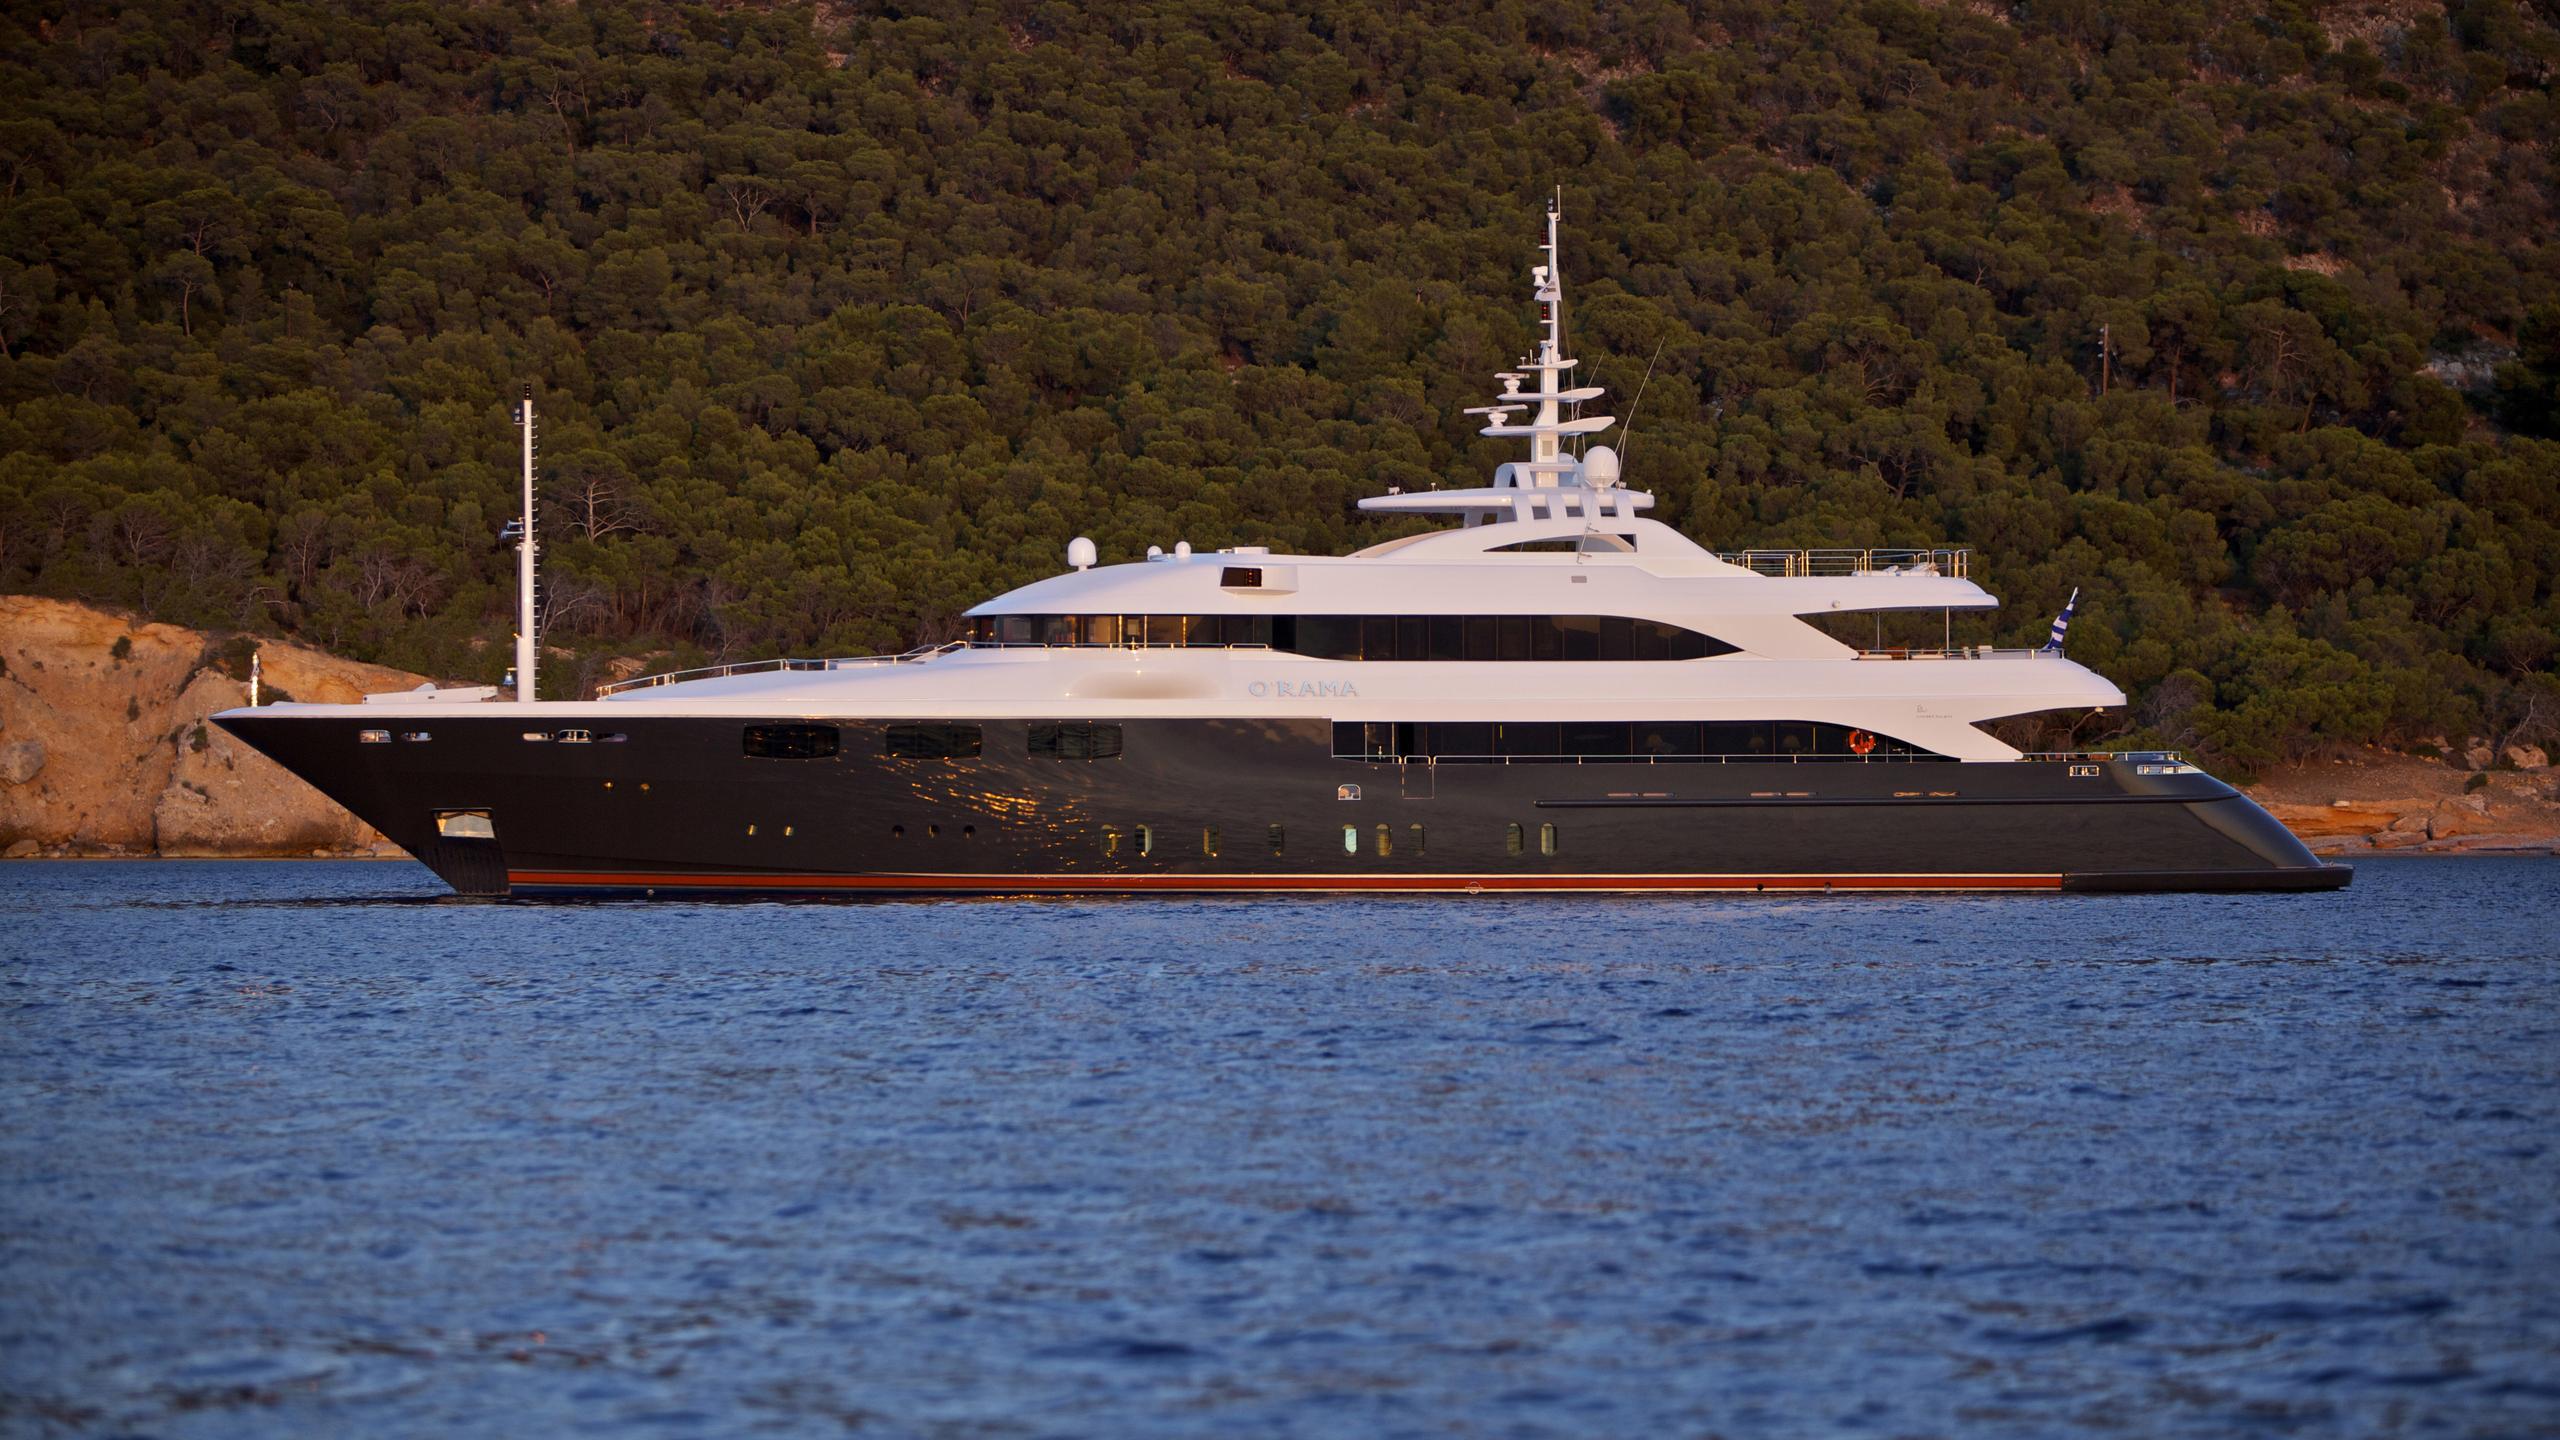 orama-yacht-at-anchor